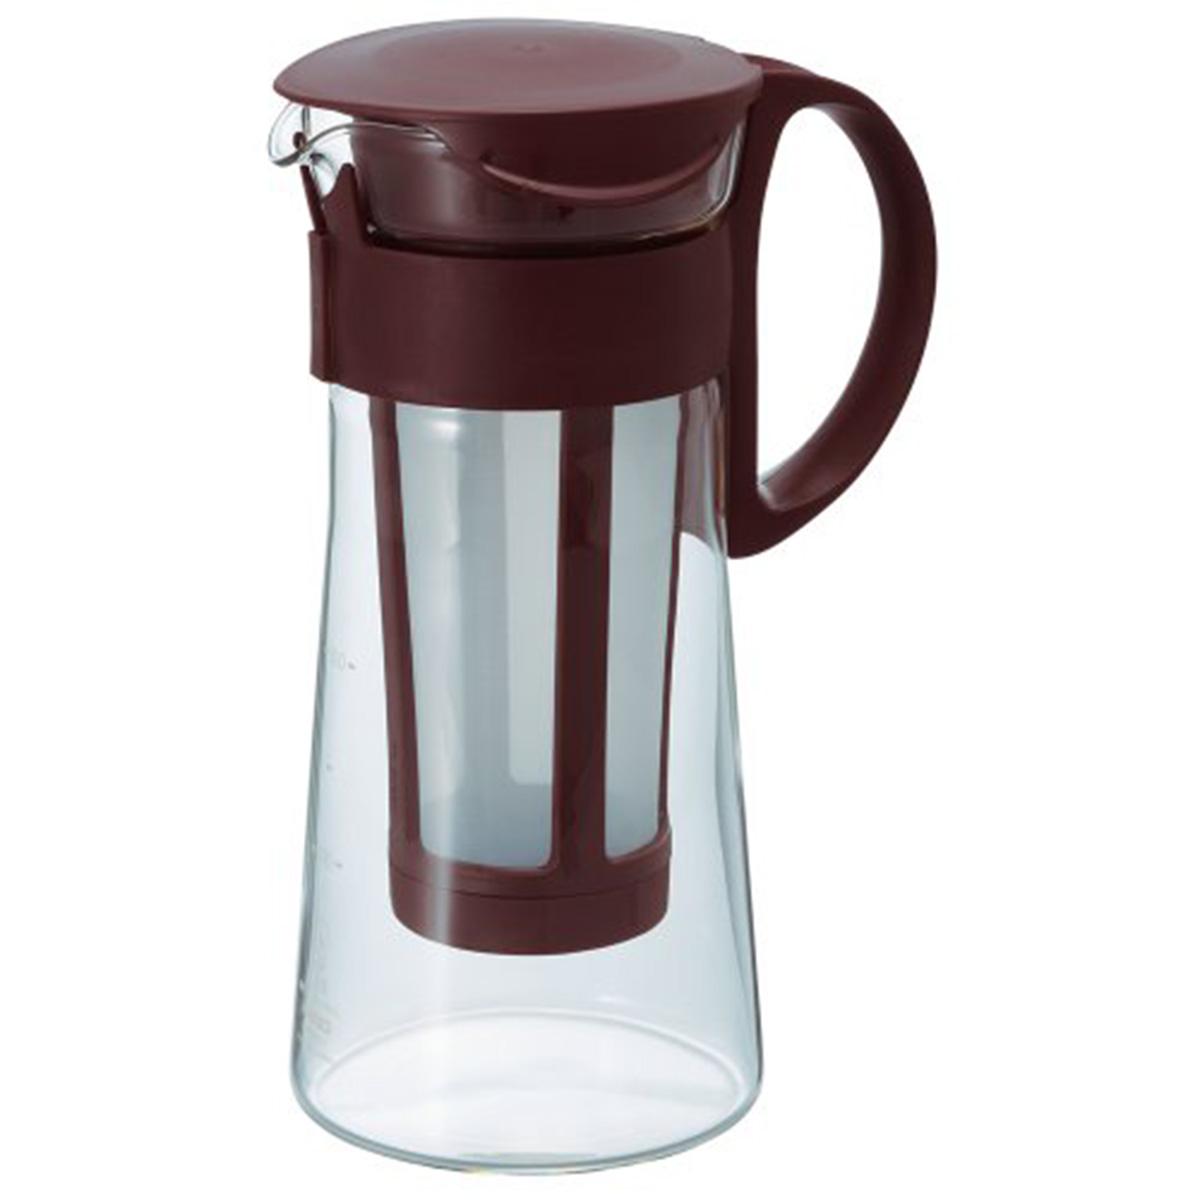 Water-Brew-Coffee-Pot